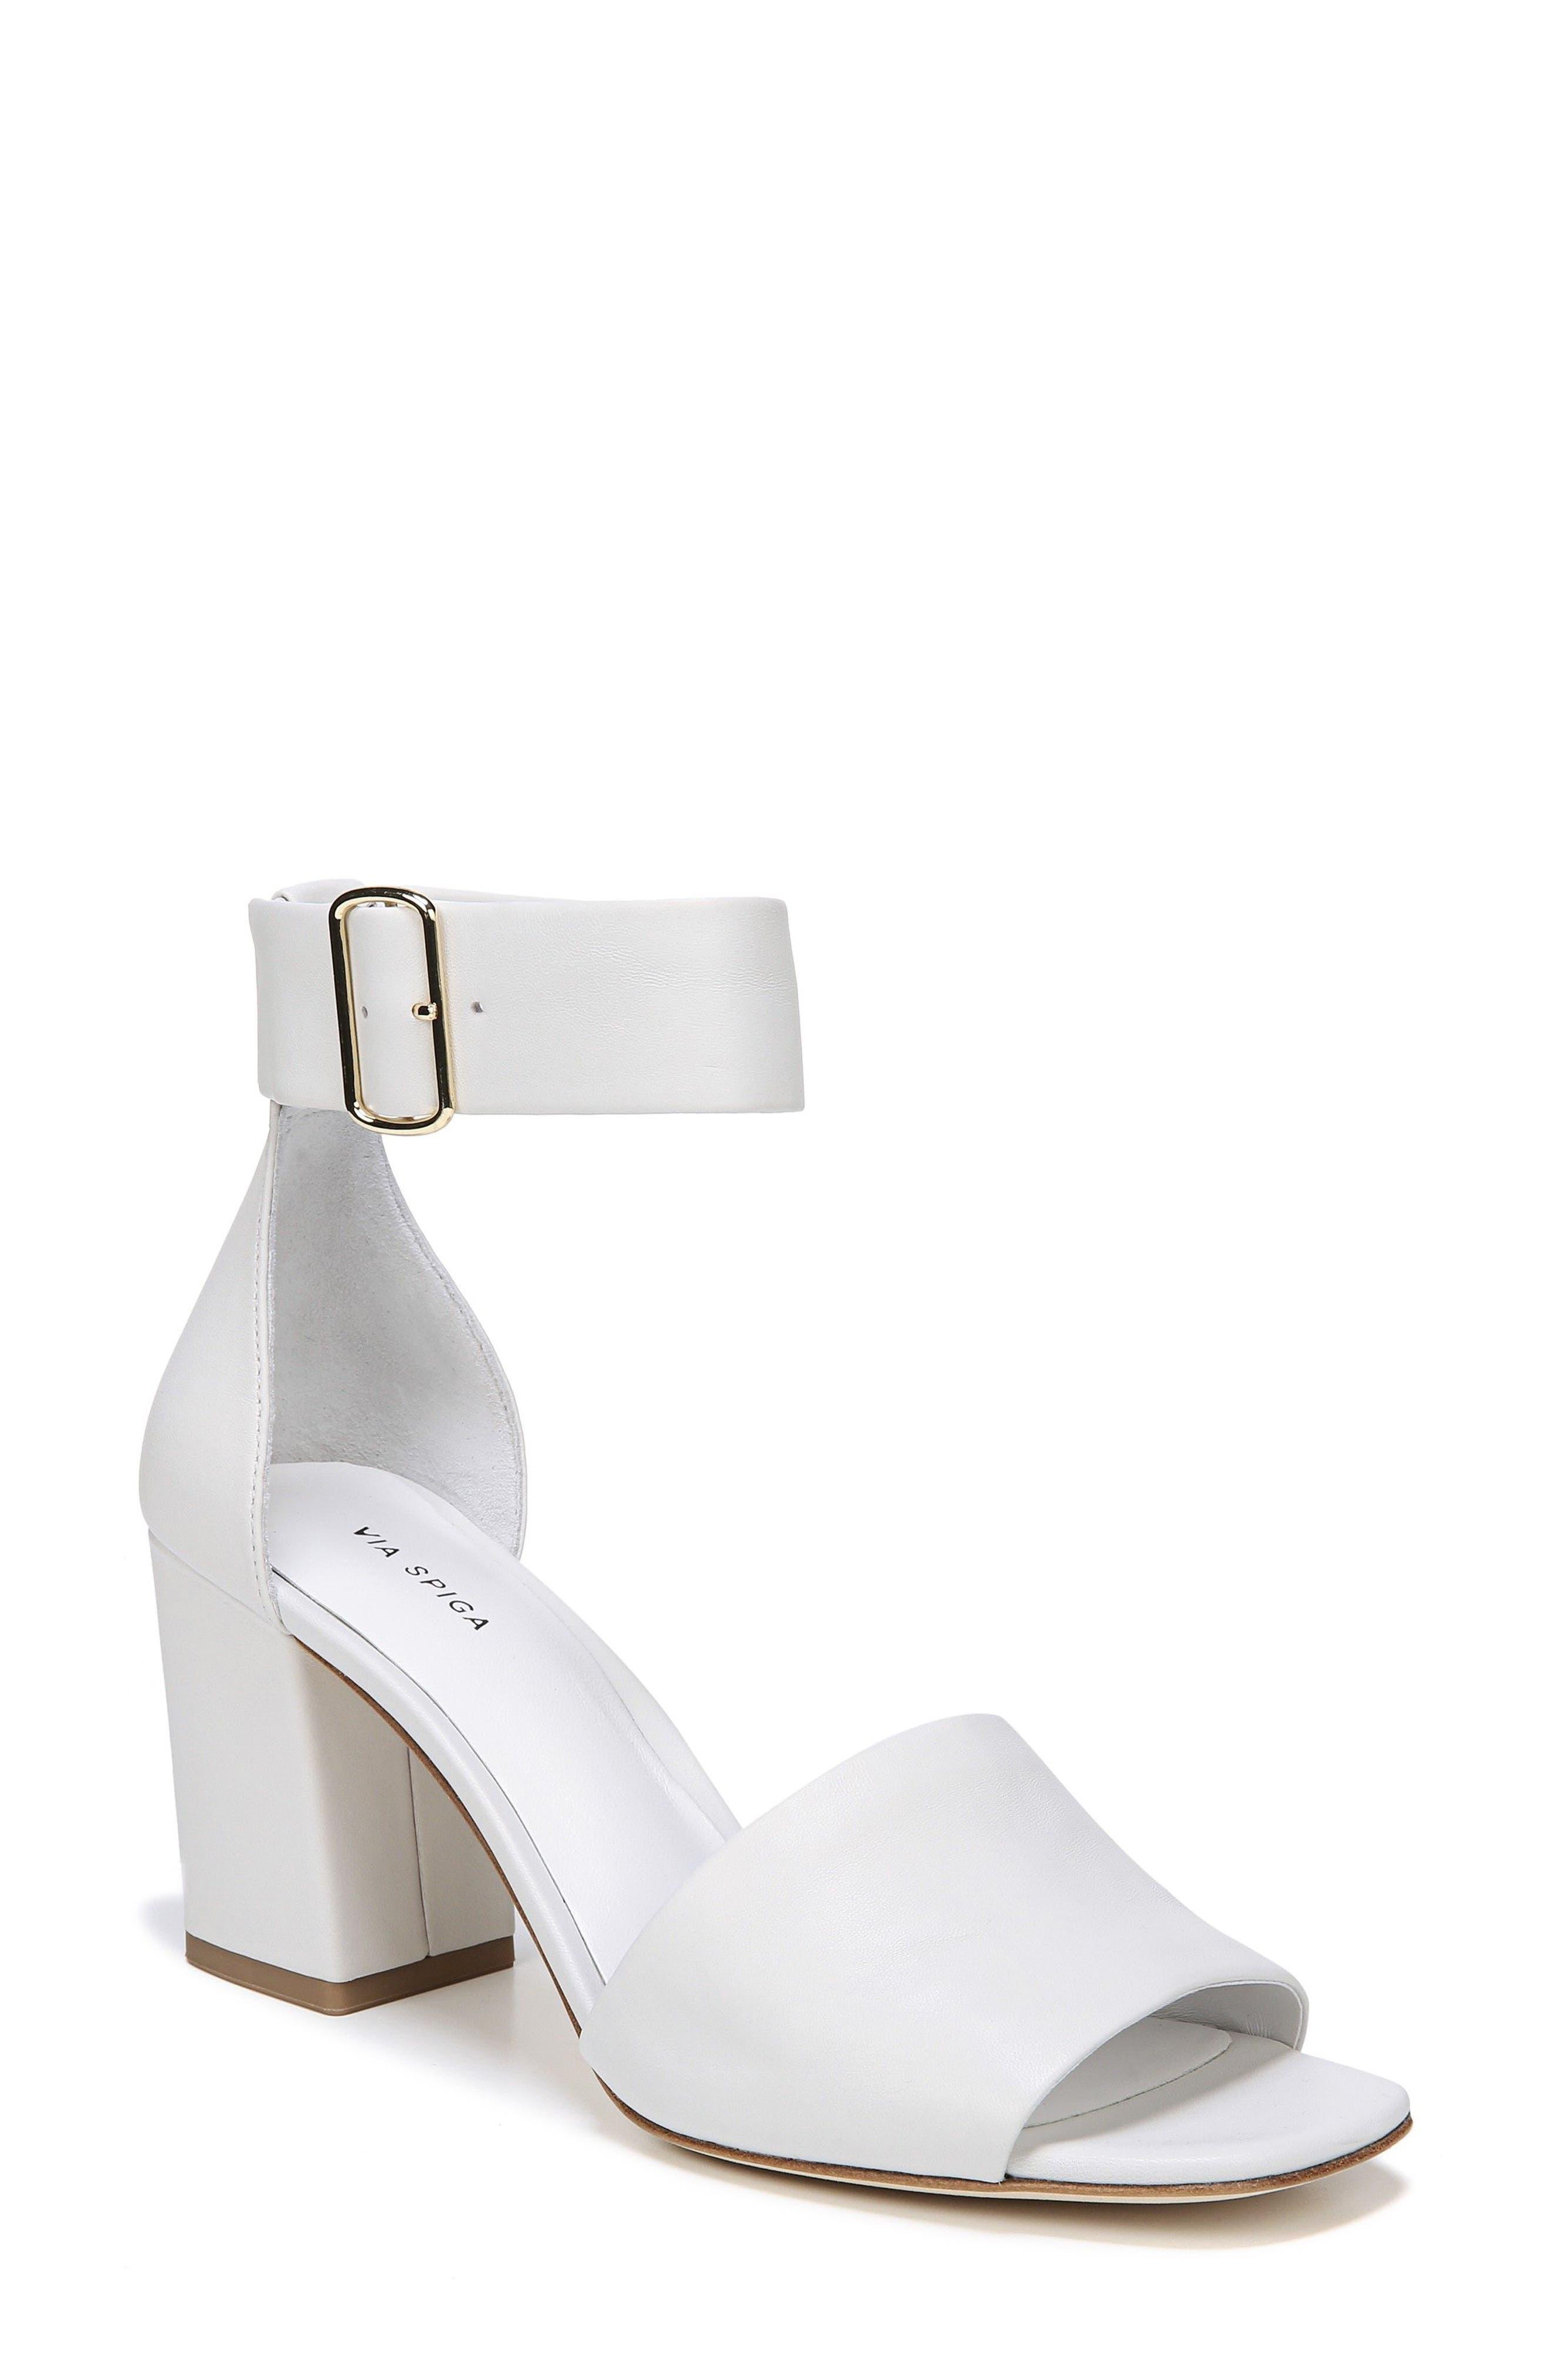 Evonne Ankle Strap Sandal,                         Main,                         color, 100